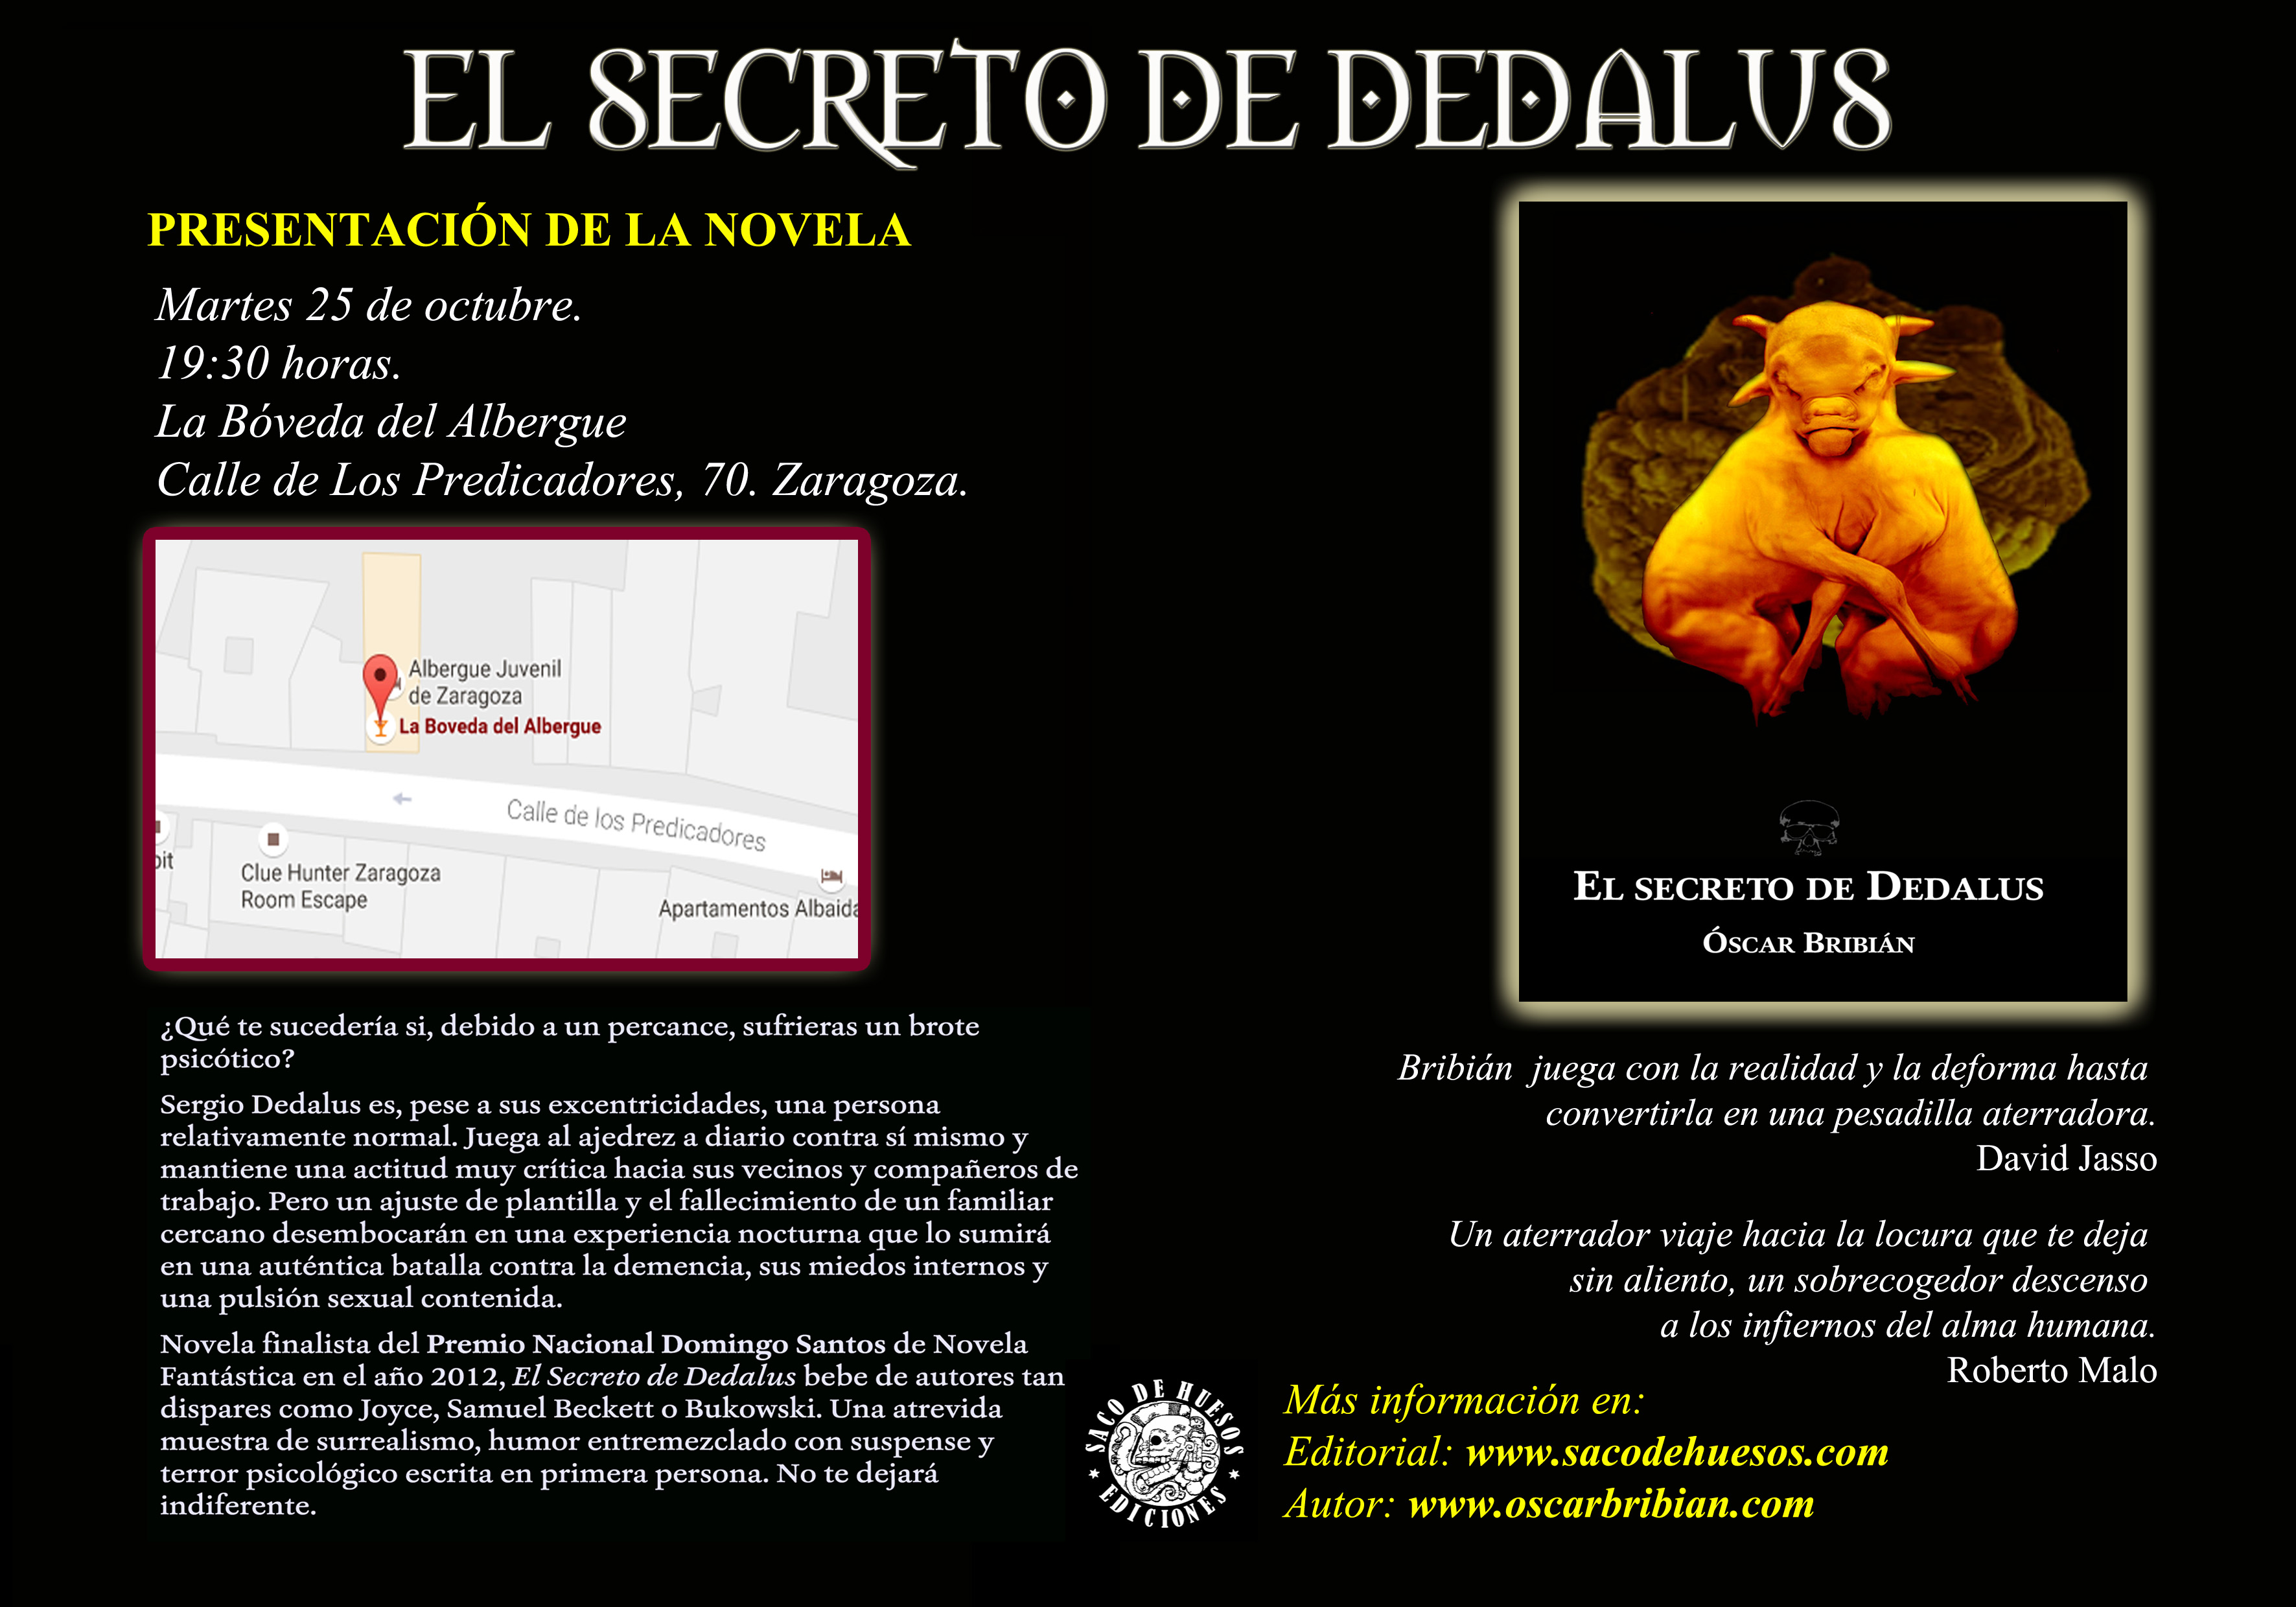 elsecretodededalus_presentacion